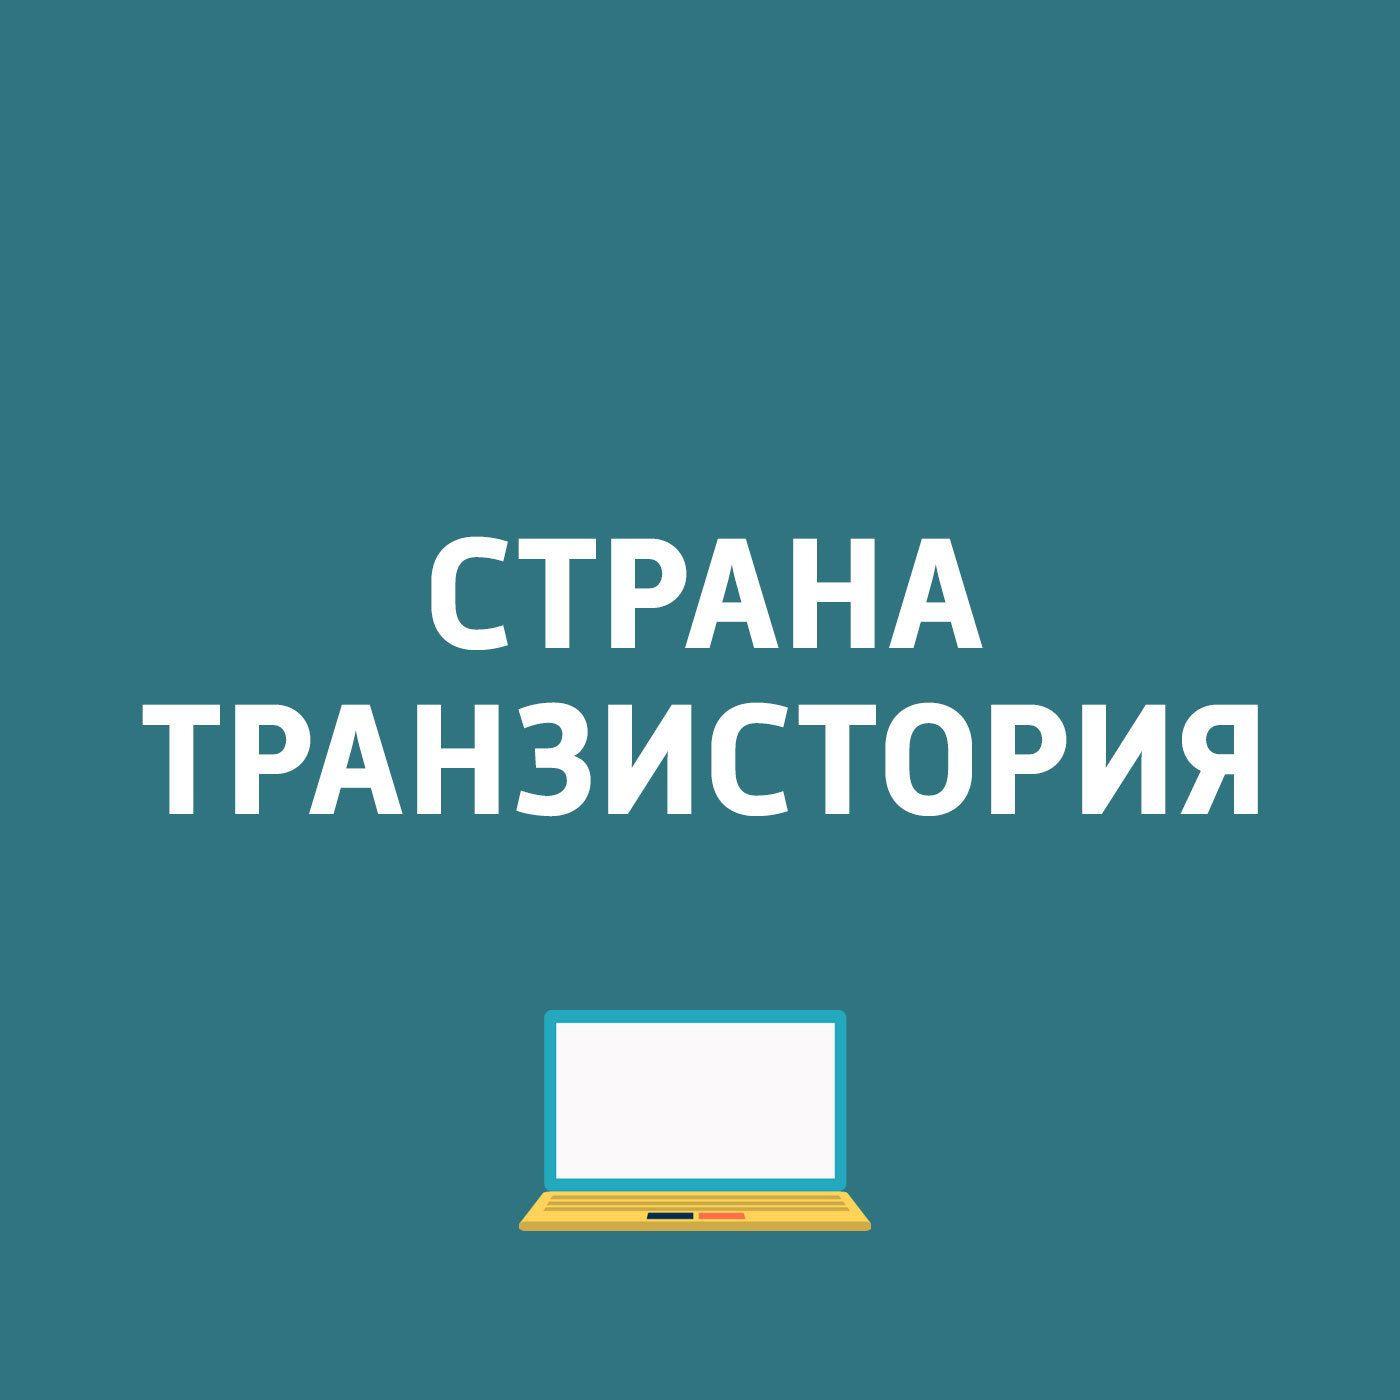 Картаев Павел НР Innovation Summit картаев павел голосовая помощница алиса